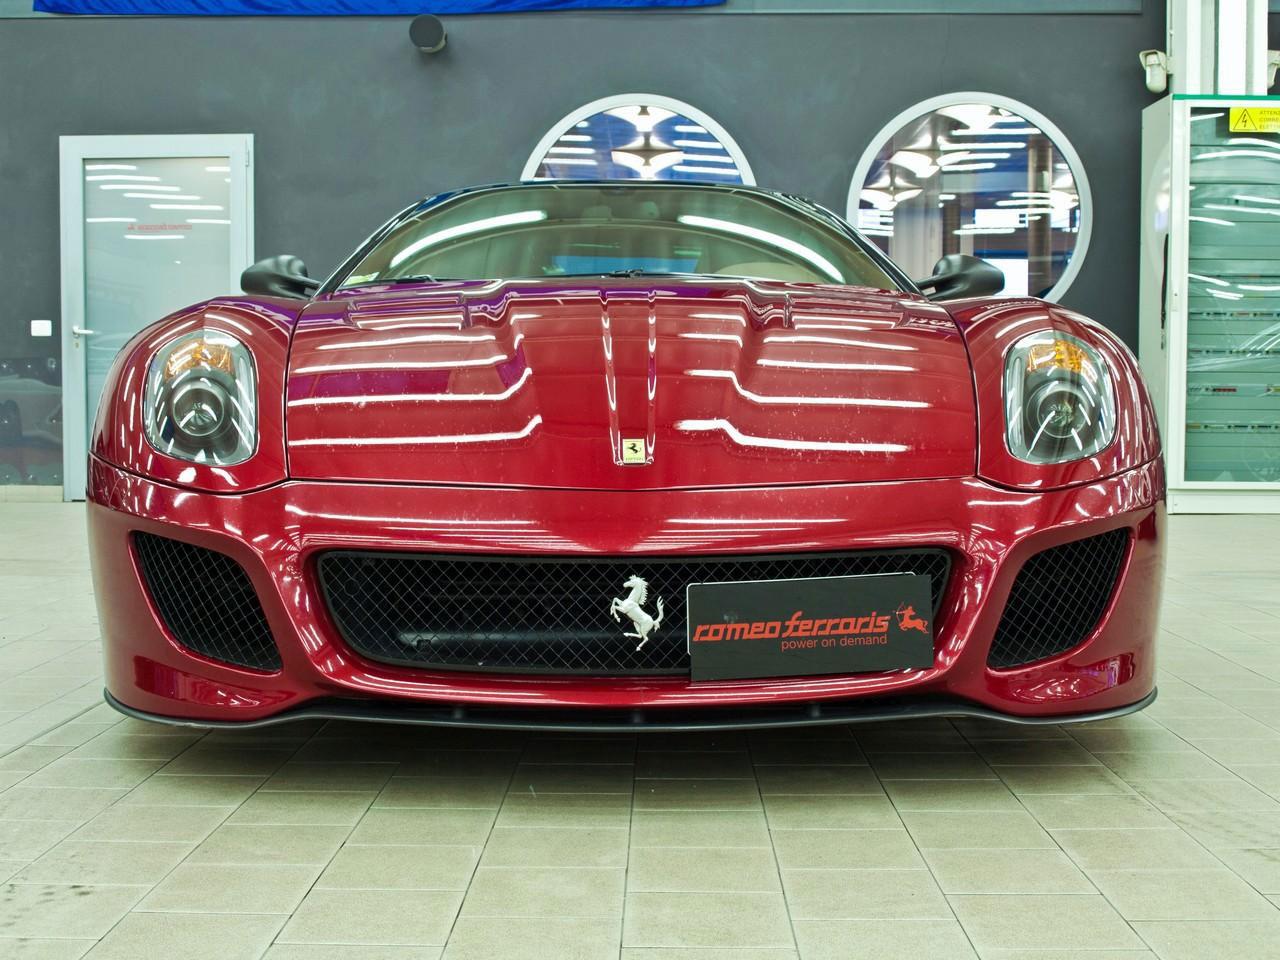 Ferrari 599 GTO má 710 koní od Romeo Ferraris 3